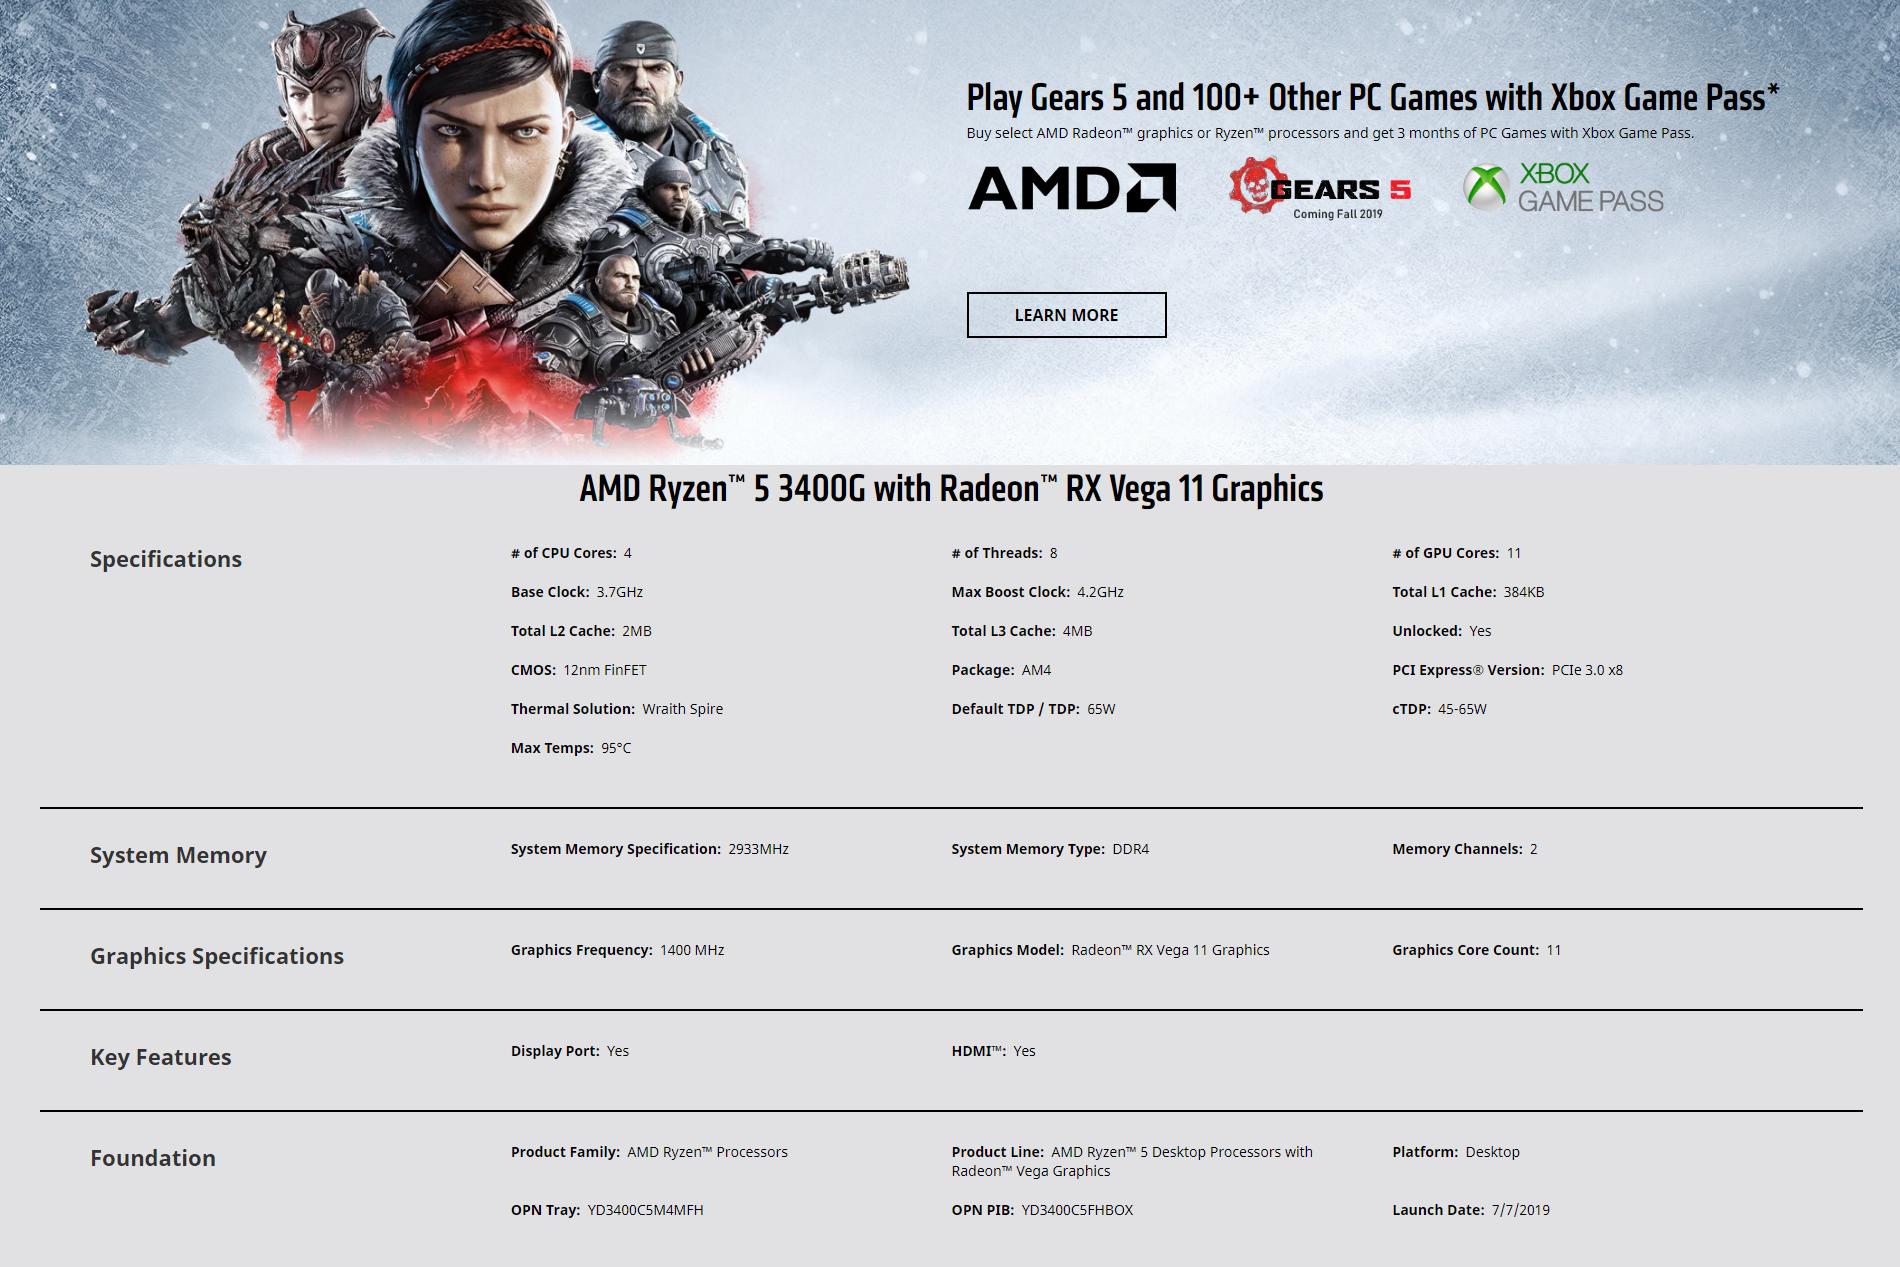 Amd Ryzen 5 3400g 3 7ghz W Radeon Rx Vega 11 Graphics Lazada